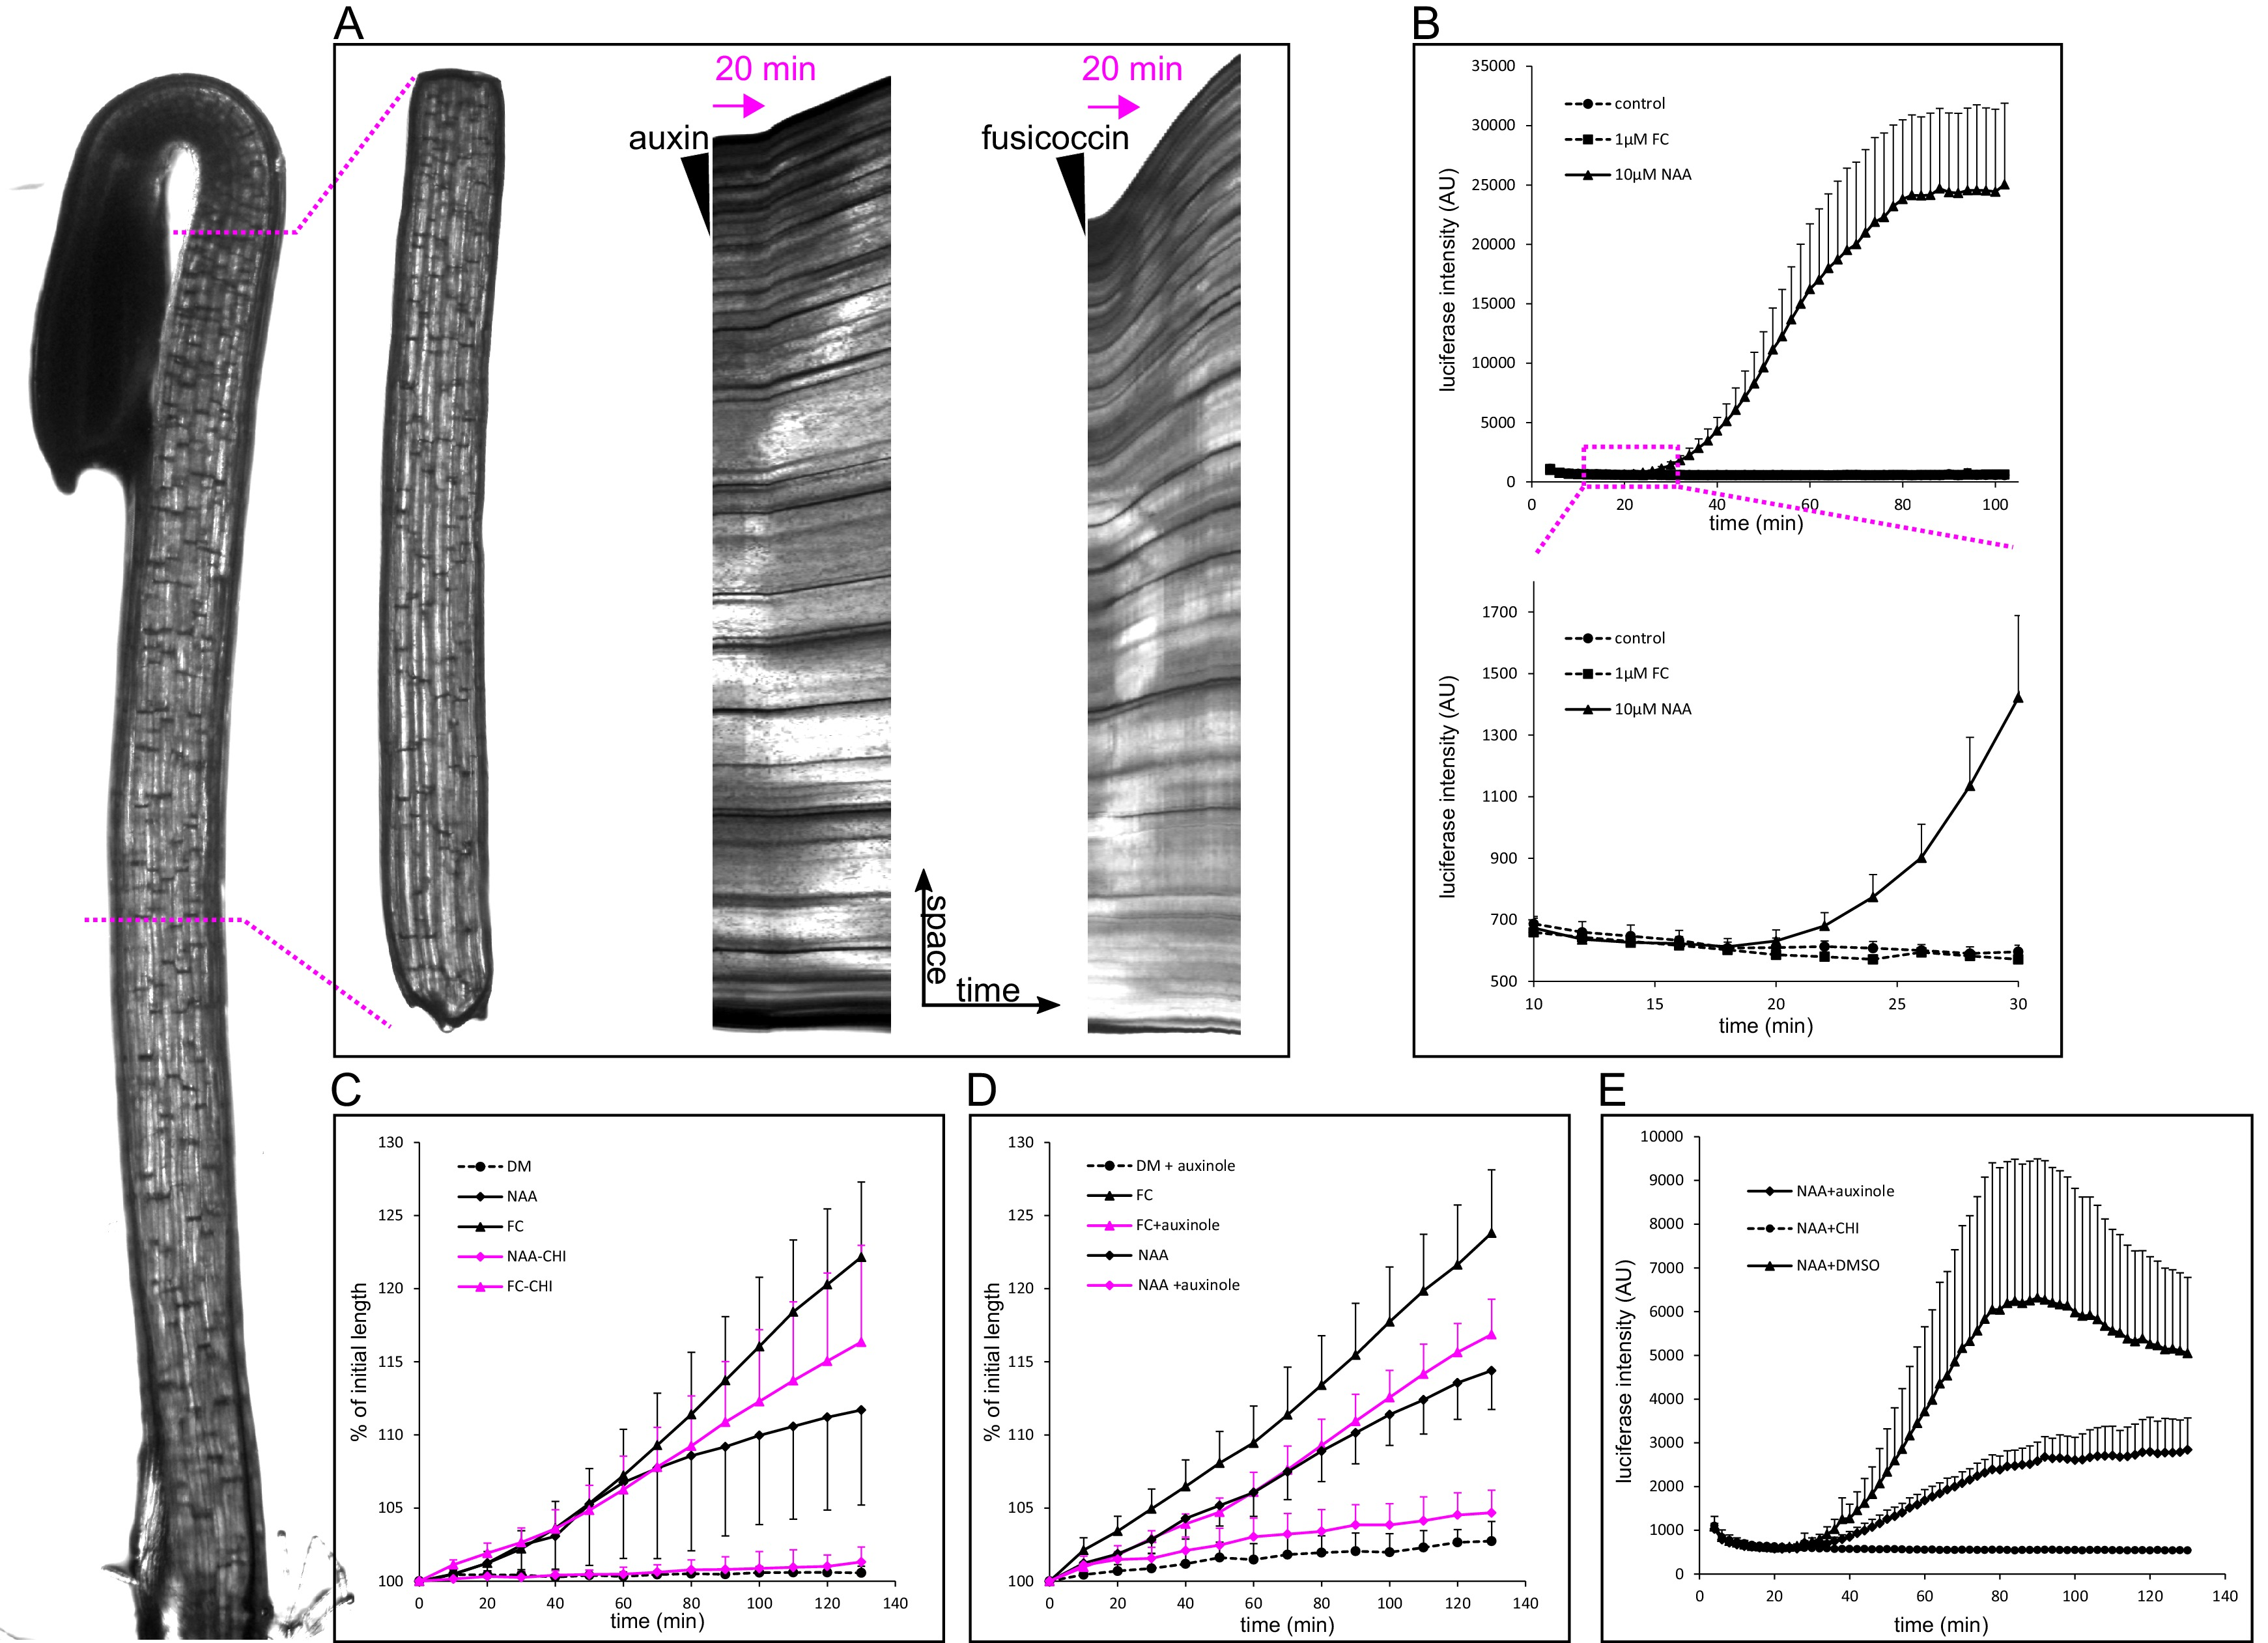 TIR1/AFB-Aux/IAA auxin perception mediates rapid cell wall